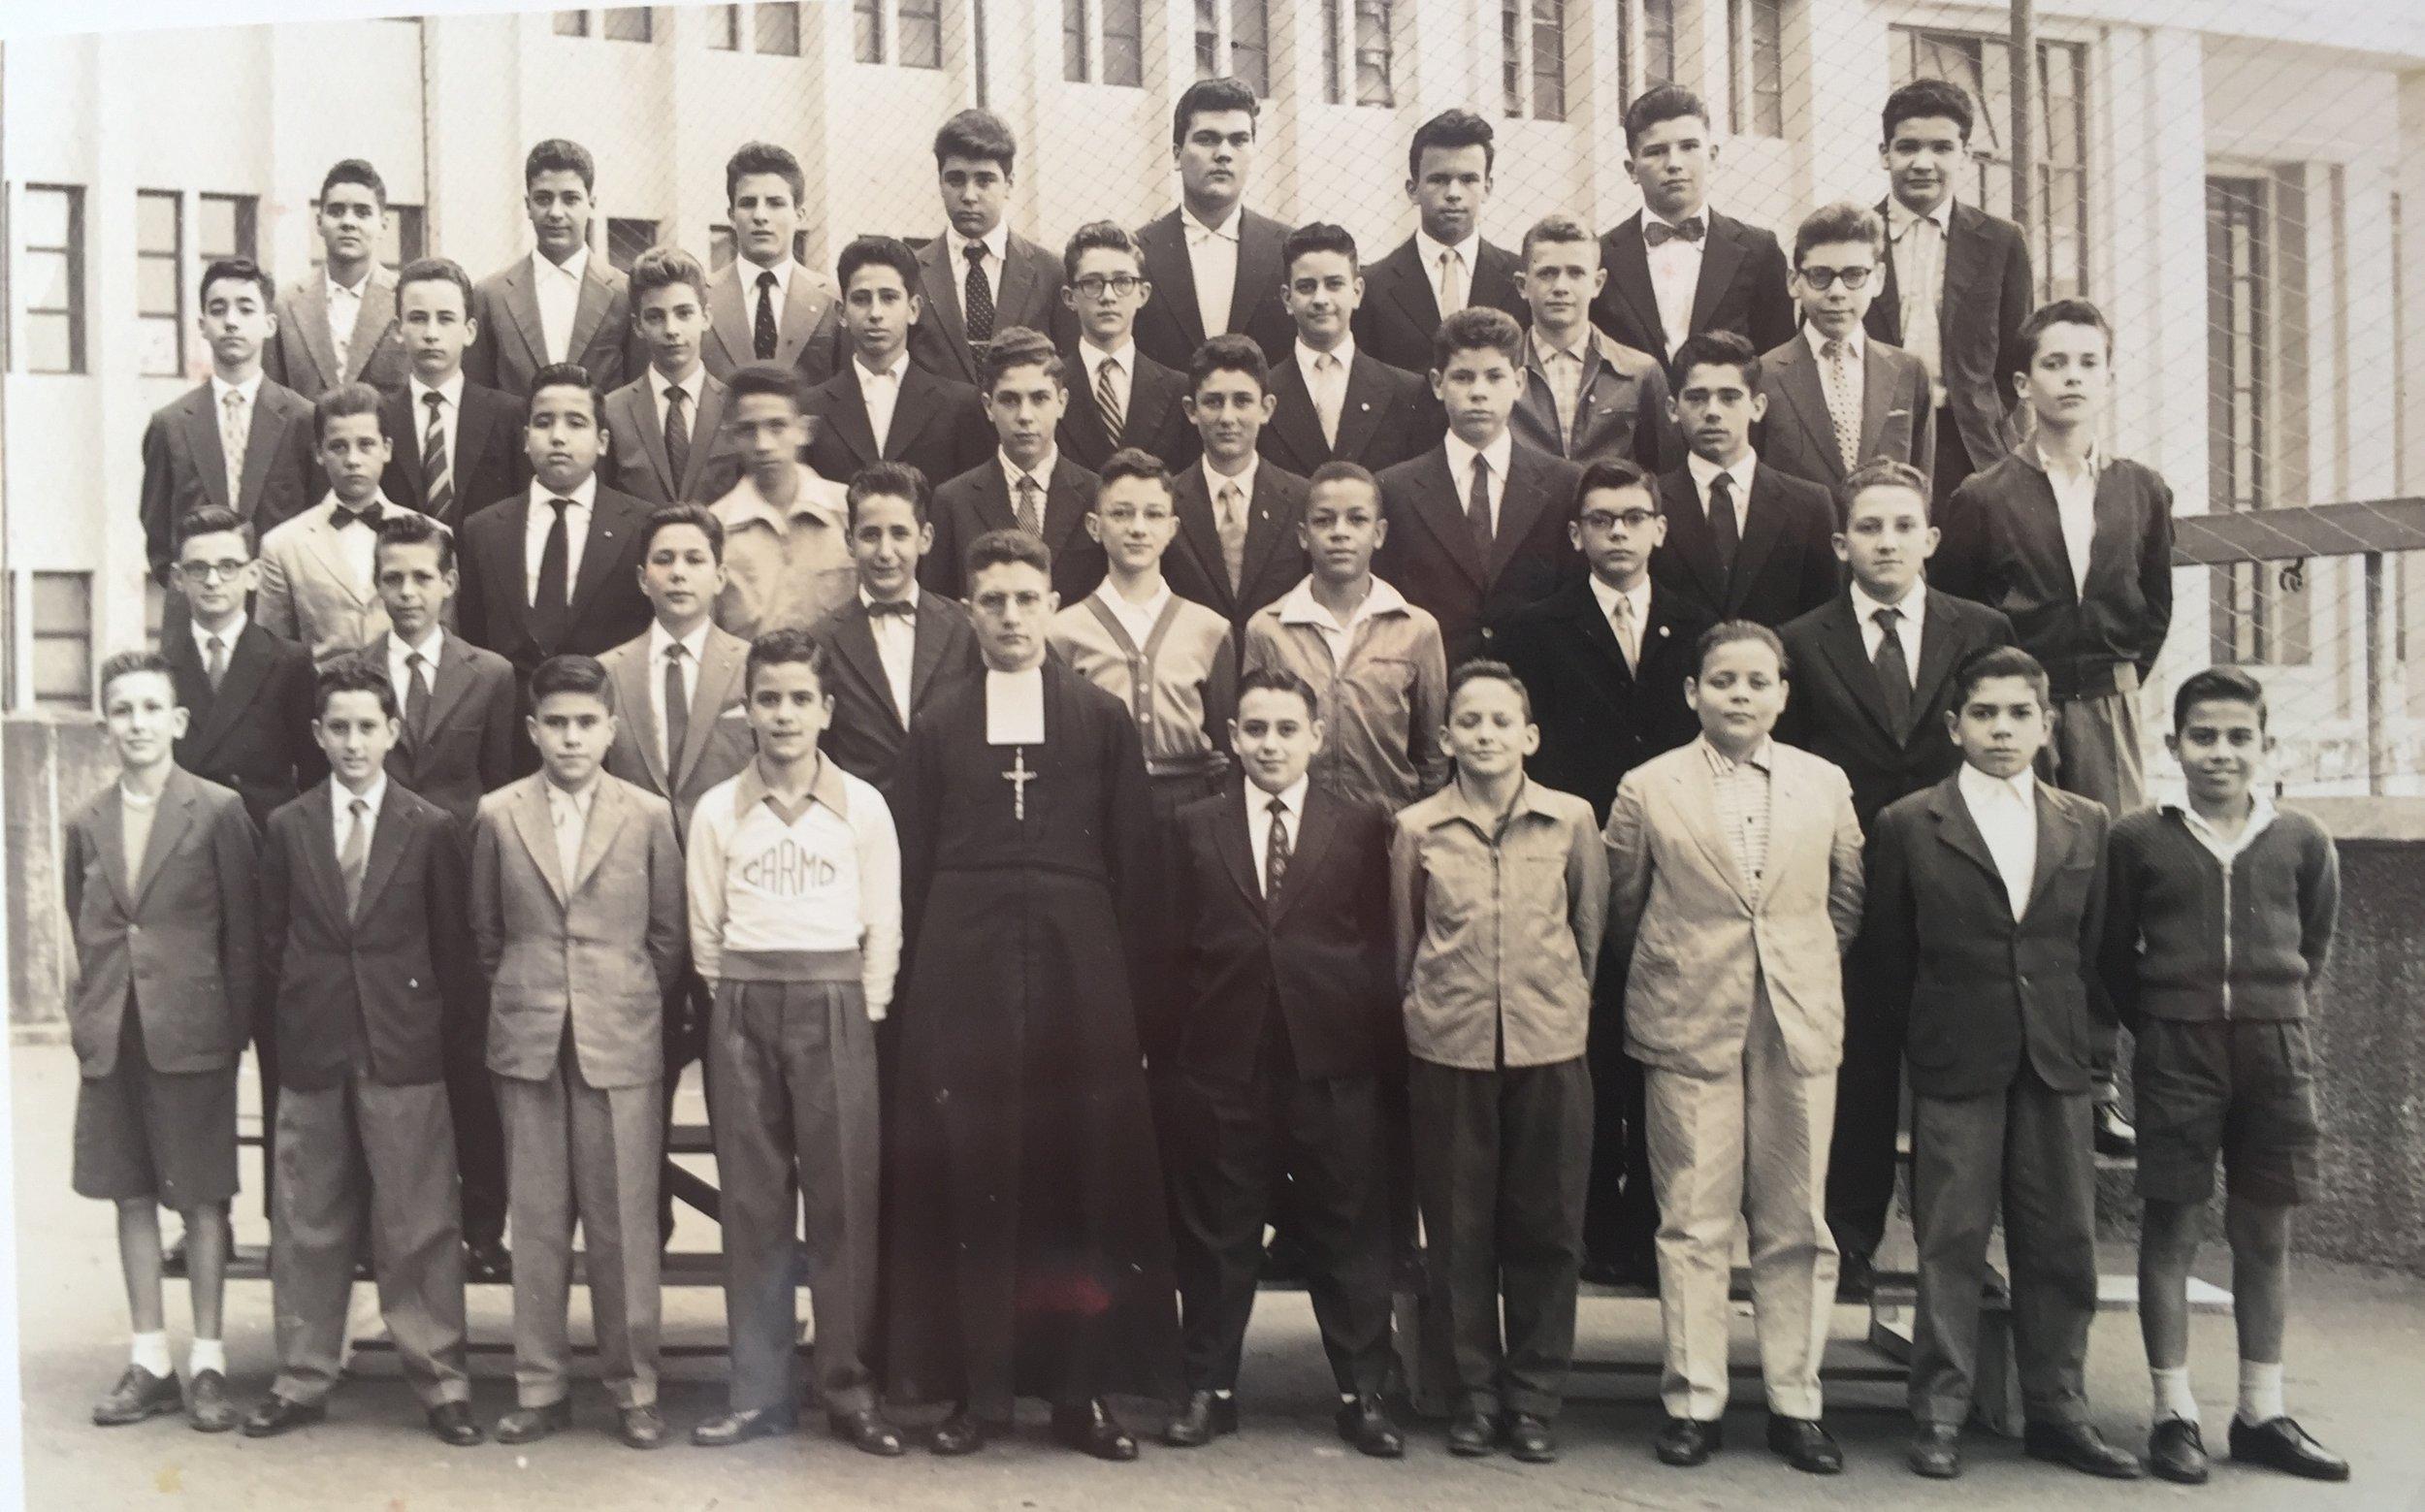 CARMO 3o Ginasial 1958.jpg